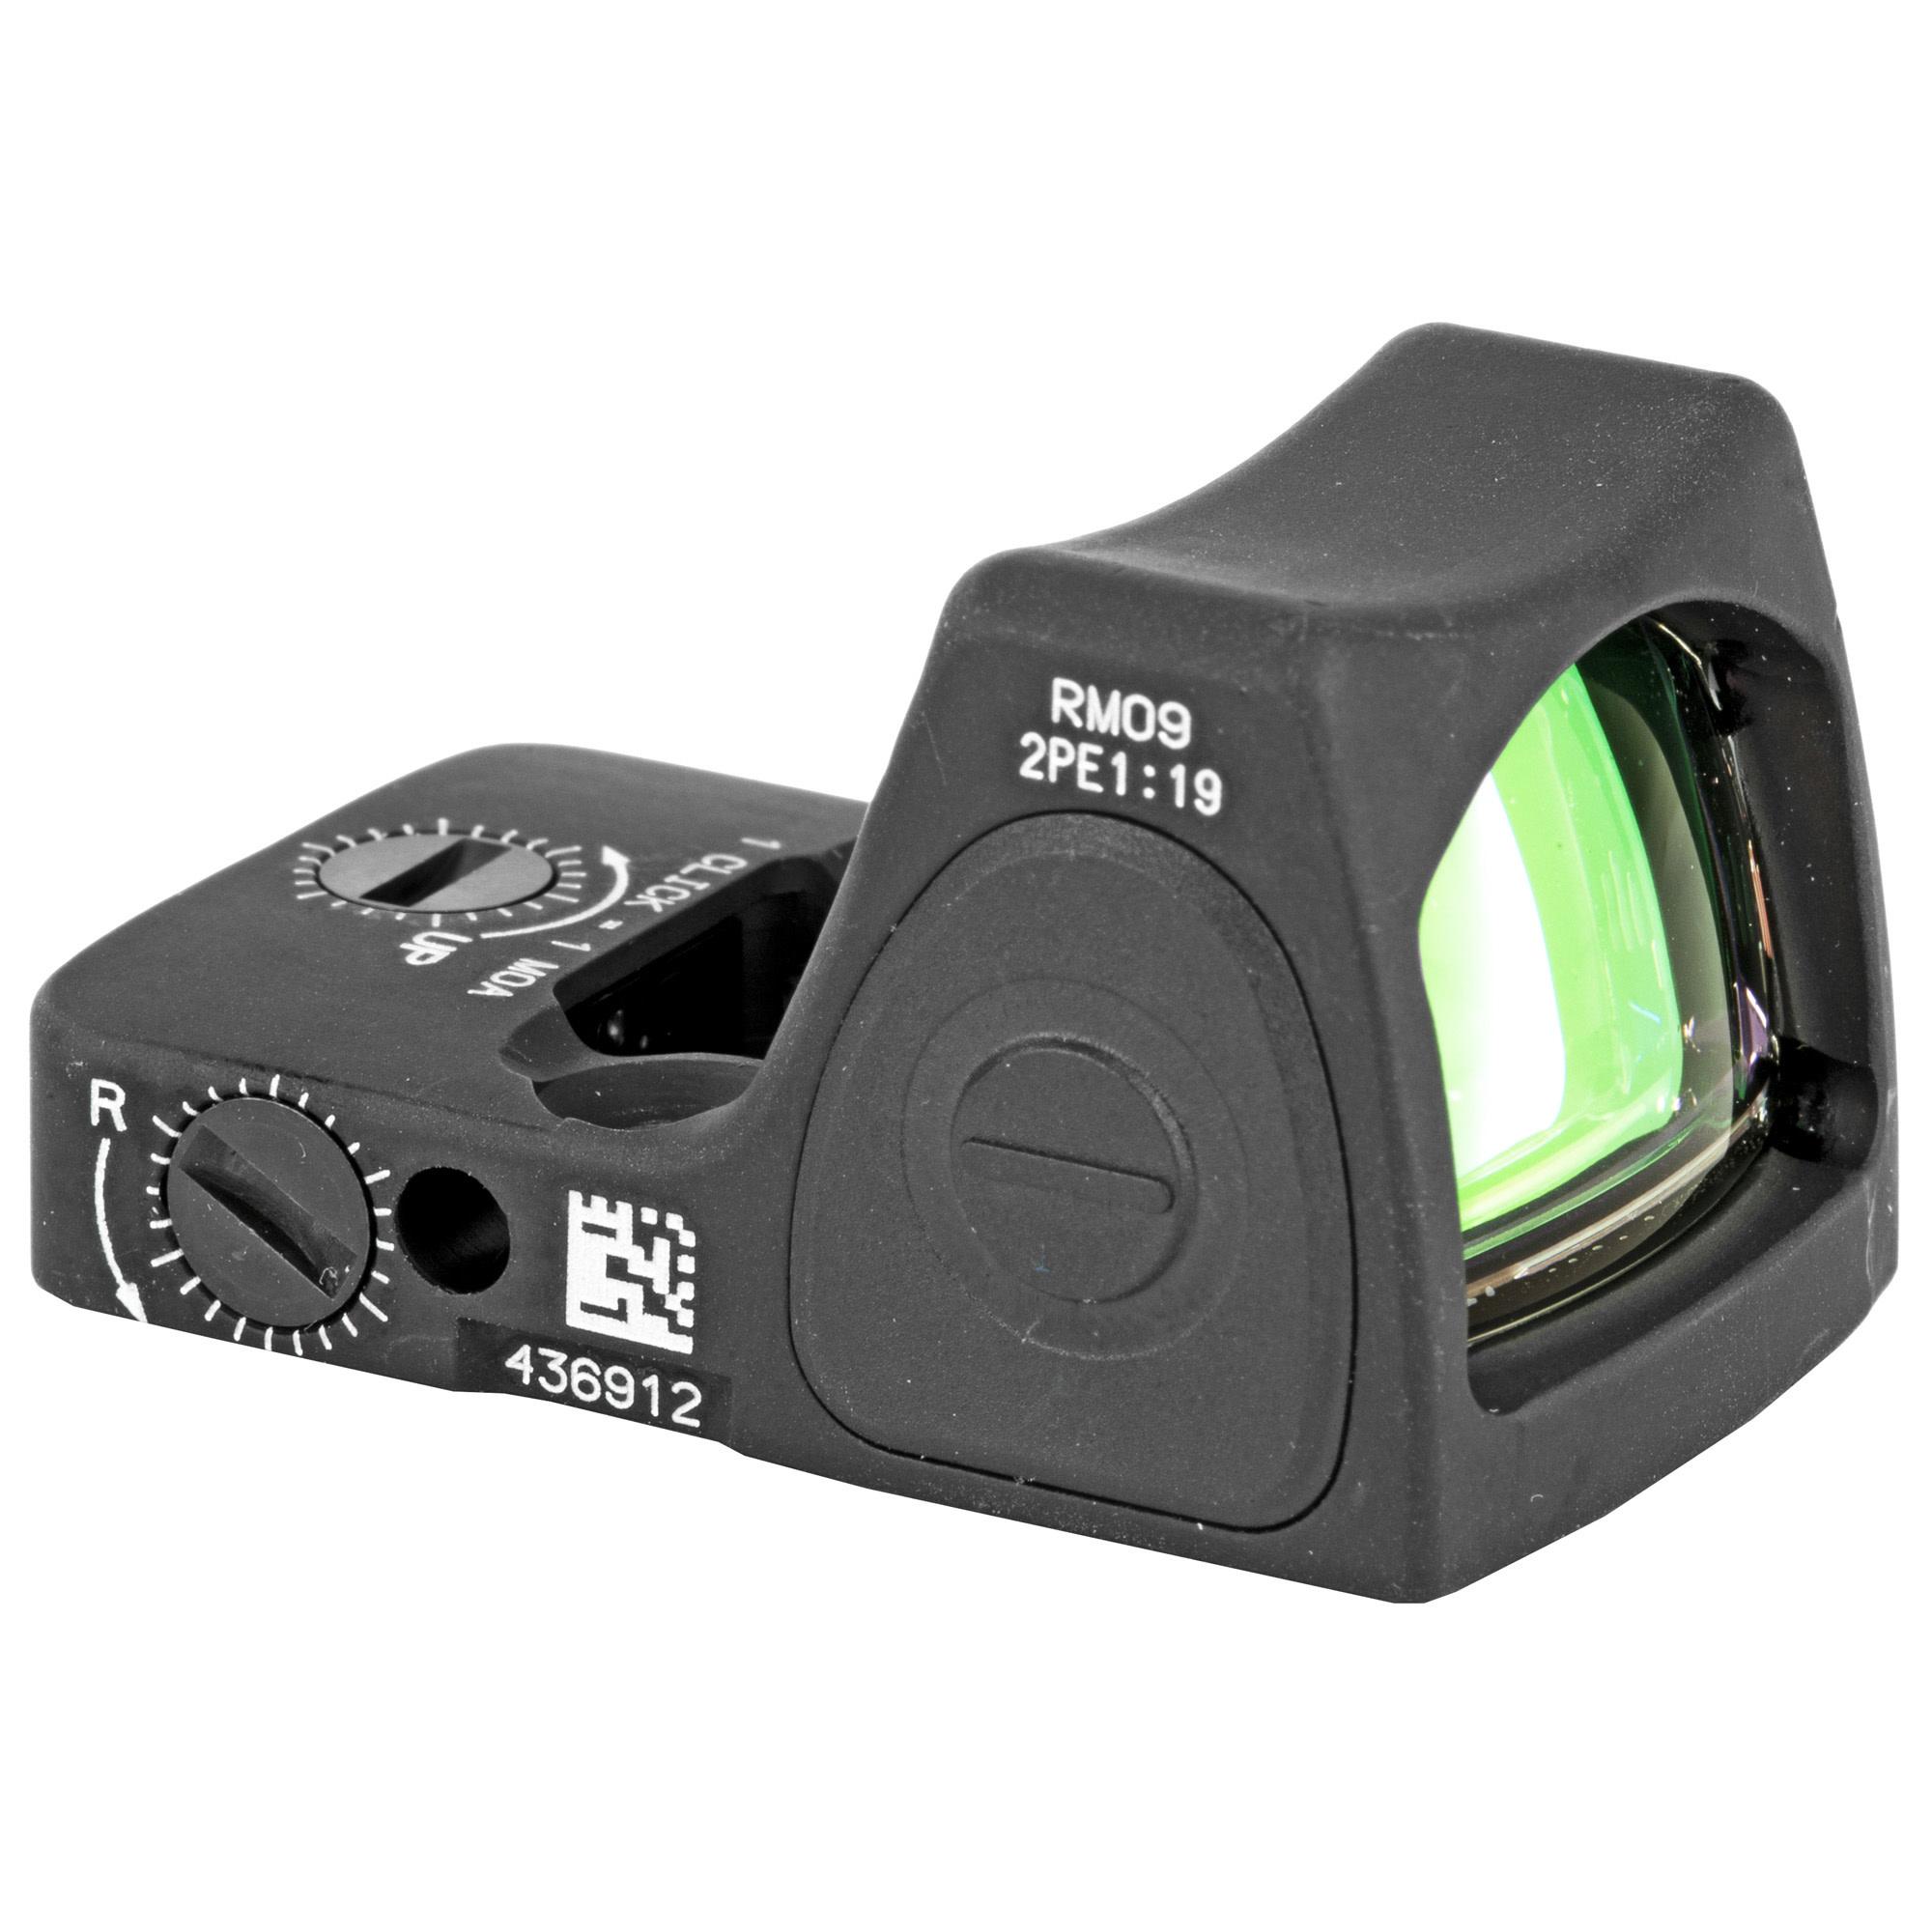 Trijicon RM09 Type 2 adjustable LED RMR, 1 MOA Dot